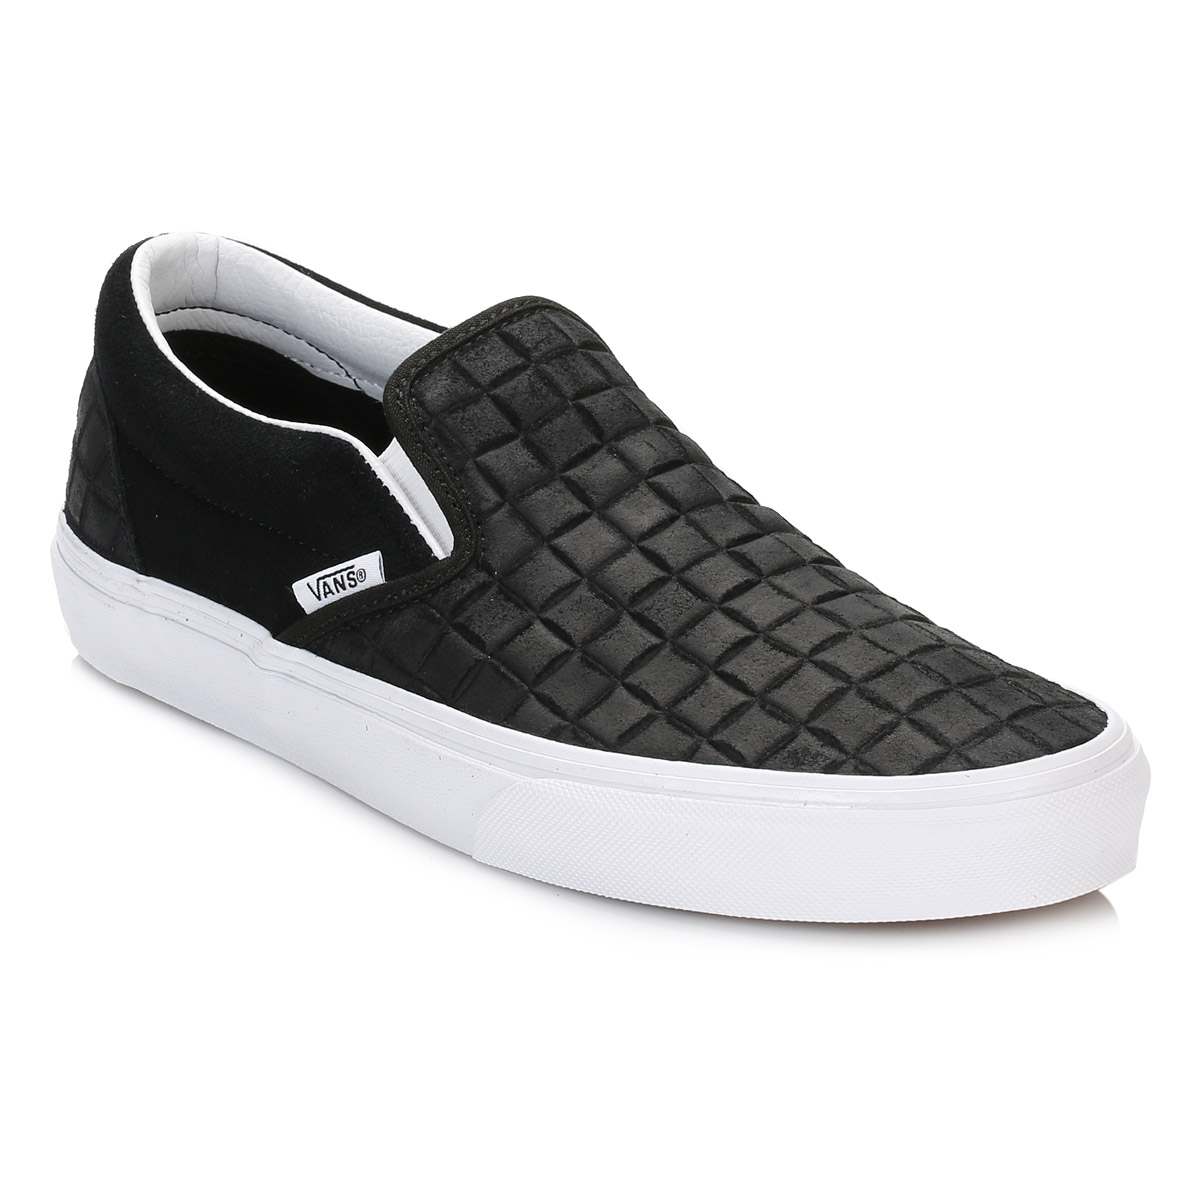 NUOVA linea uomo Vans Black Classic Slip On Pelle Scamosciata Scarpe Da Ginnastica Scarpe Da Ginnastica